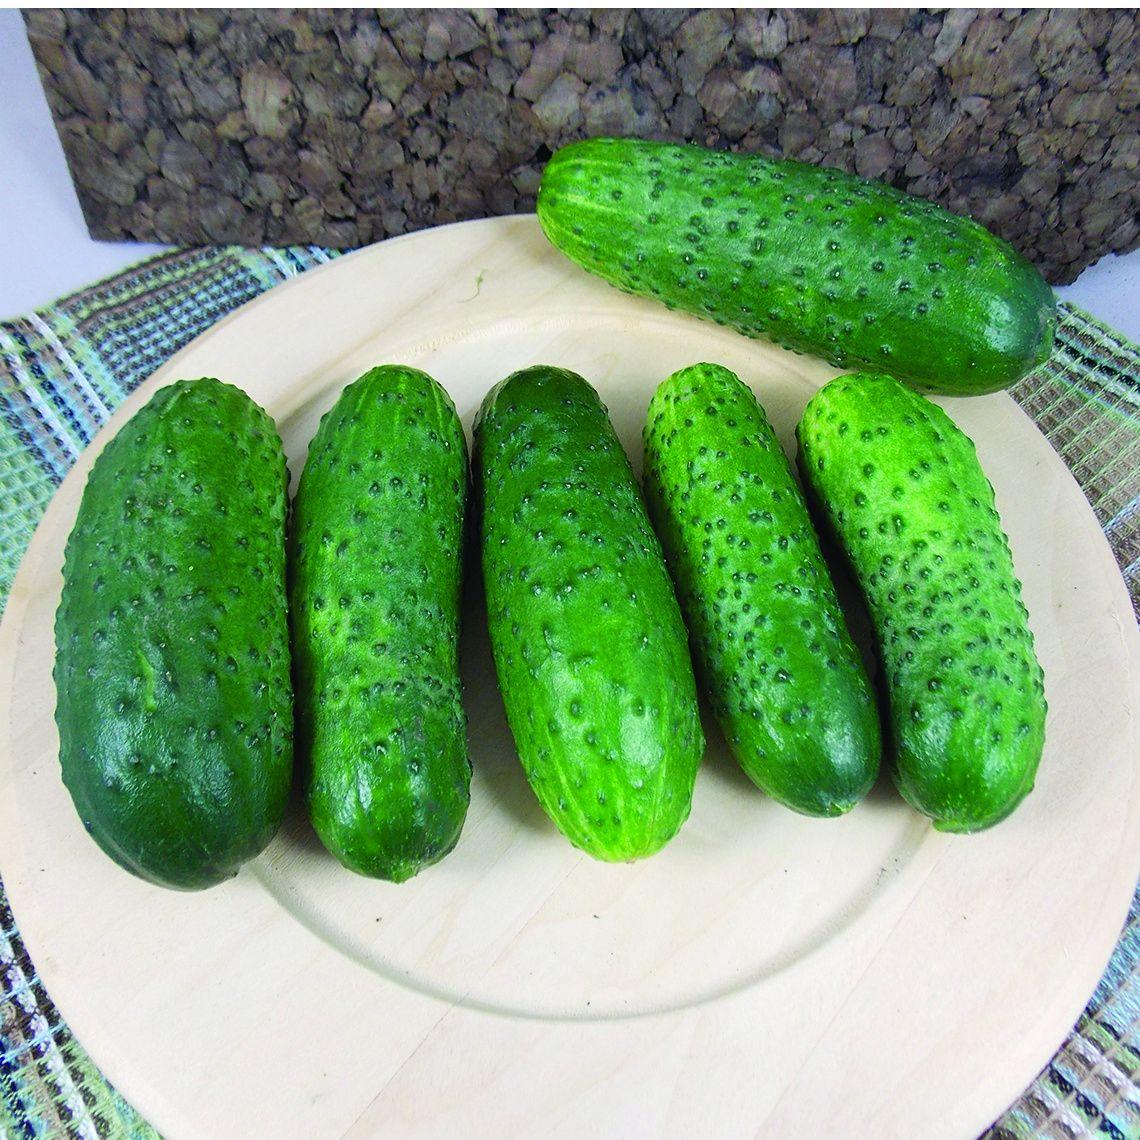 BITTER GOURD SEEDS F1 HYBRID non-GMO Vegetable Seeds for Home Gardeners